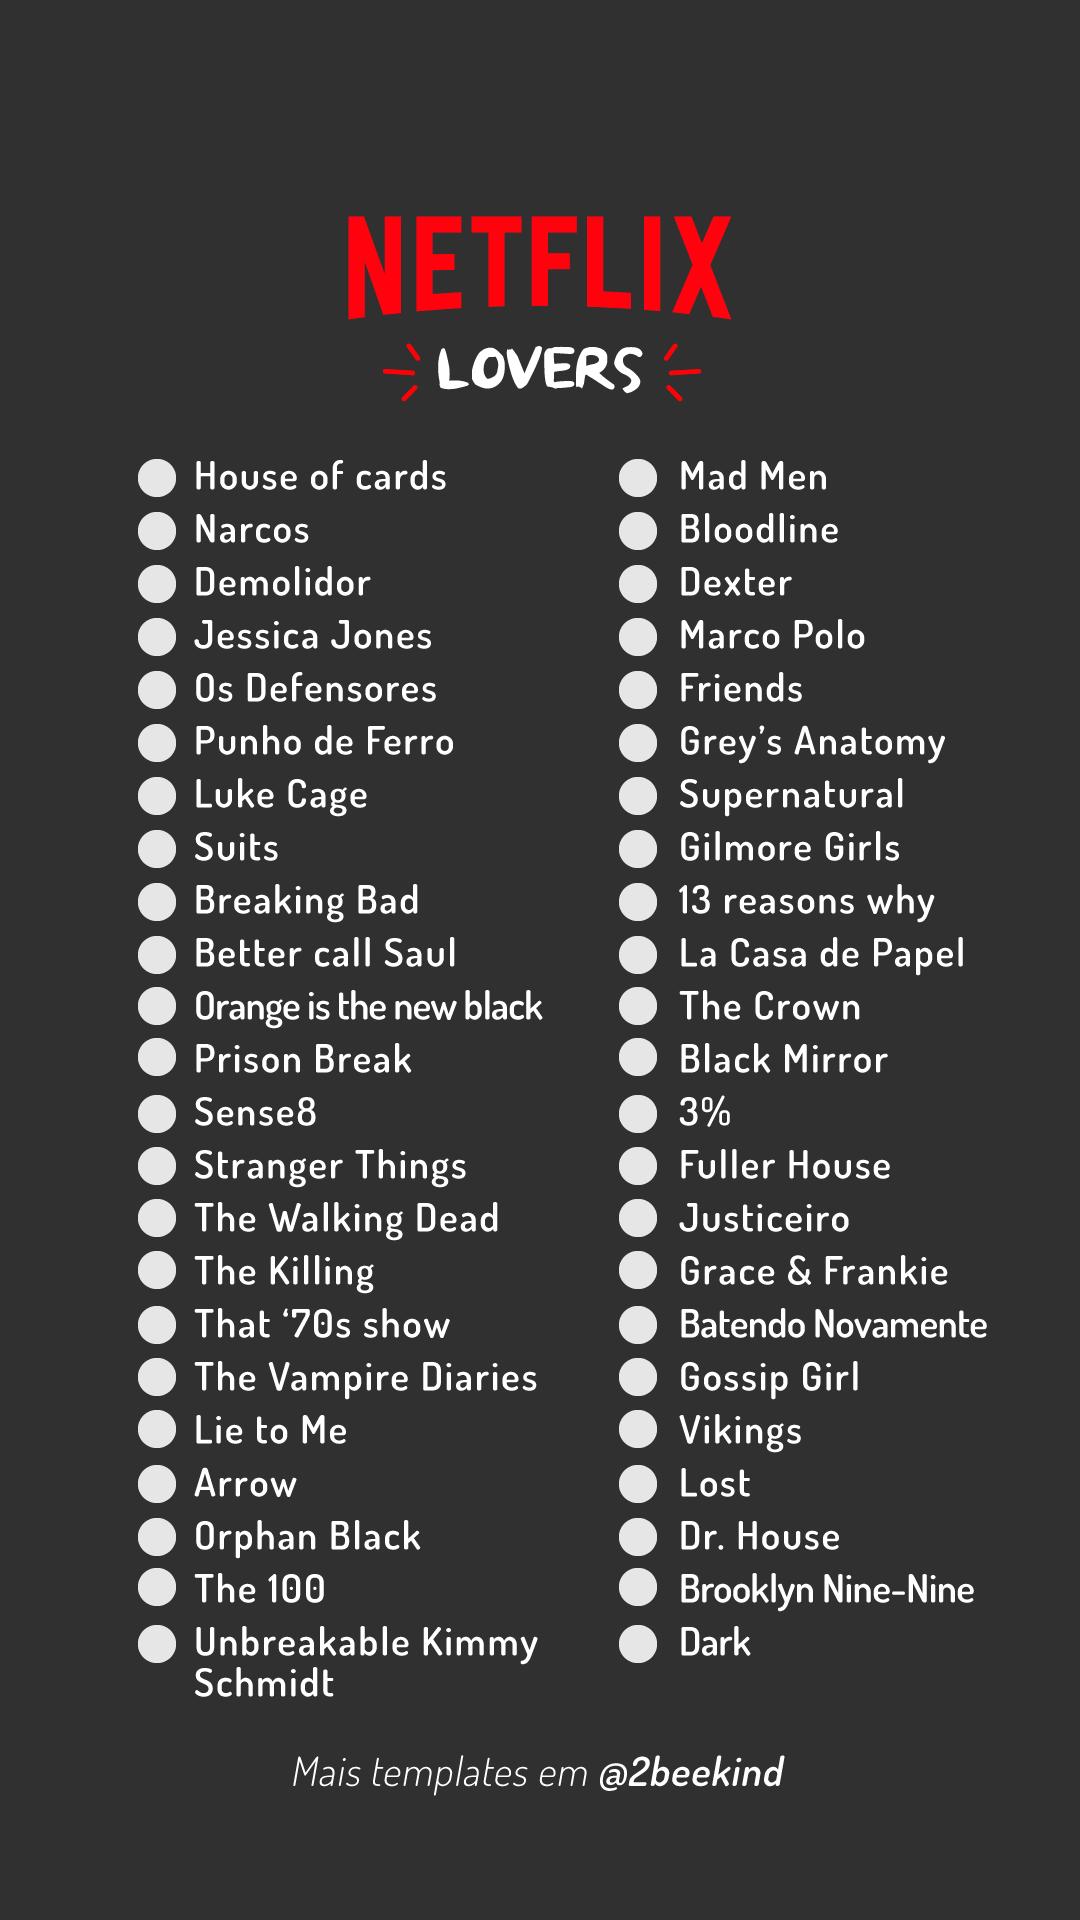 Template Stories Séries Netflix Lovers Filmes Netflix Lista De Filmes Netflix Filmes Para Assistir Netflix